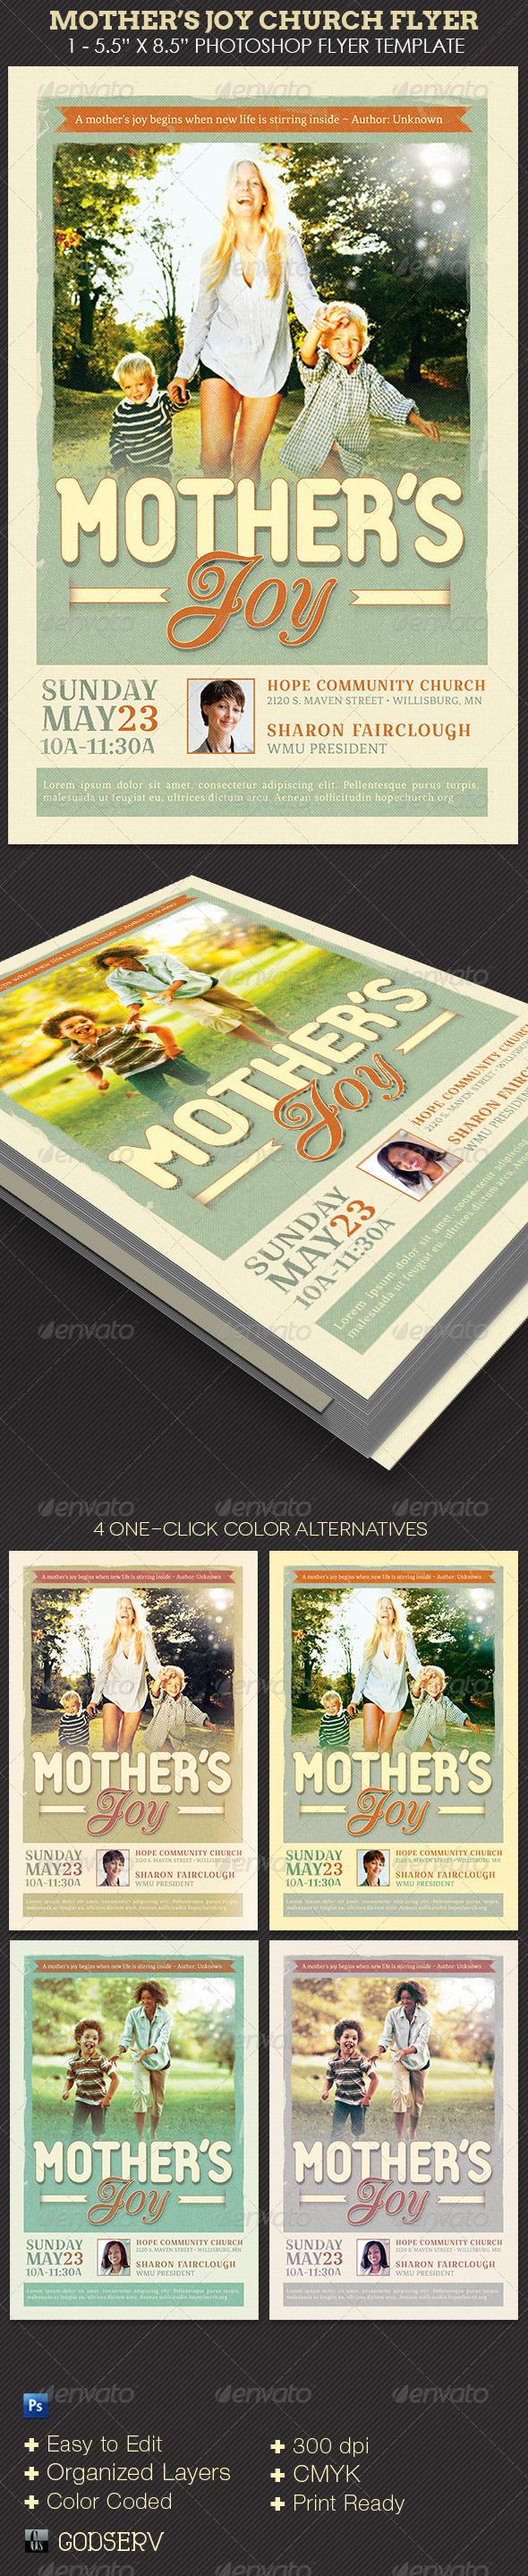 Mother's Joy Church Flyer Template